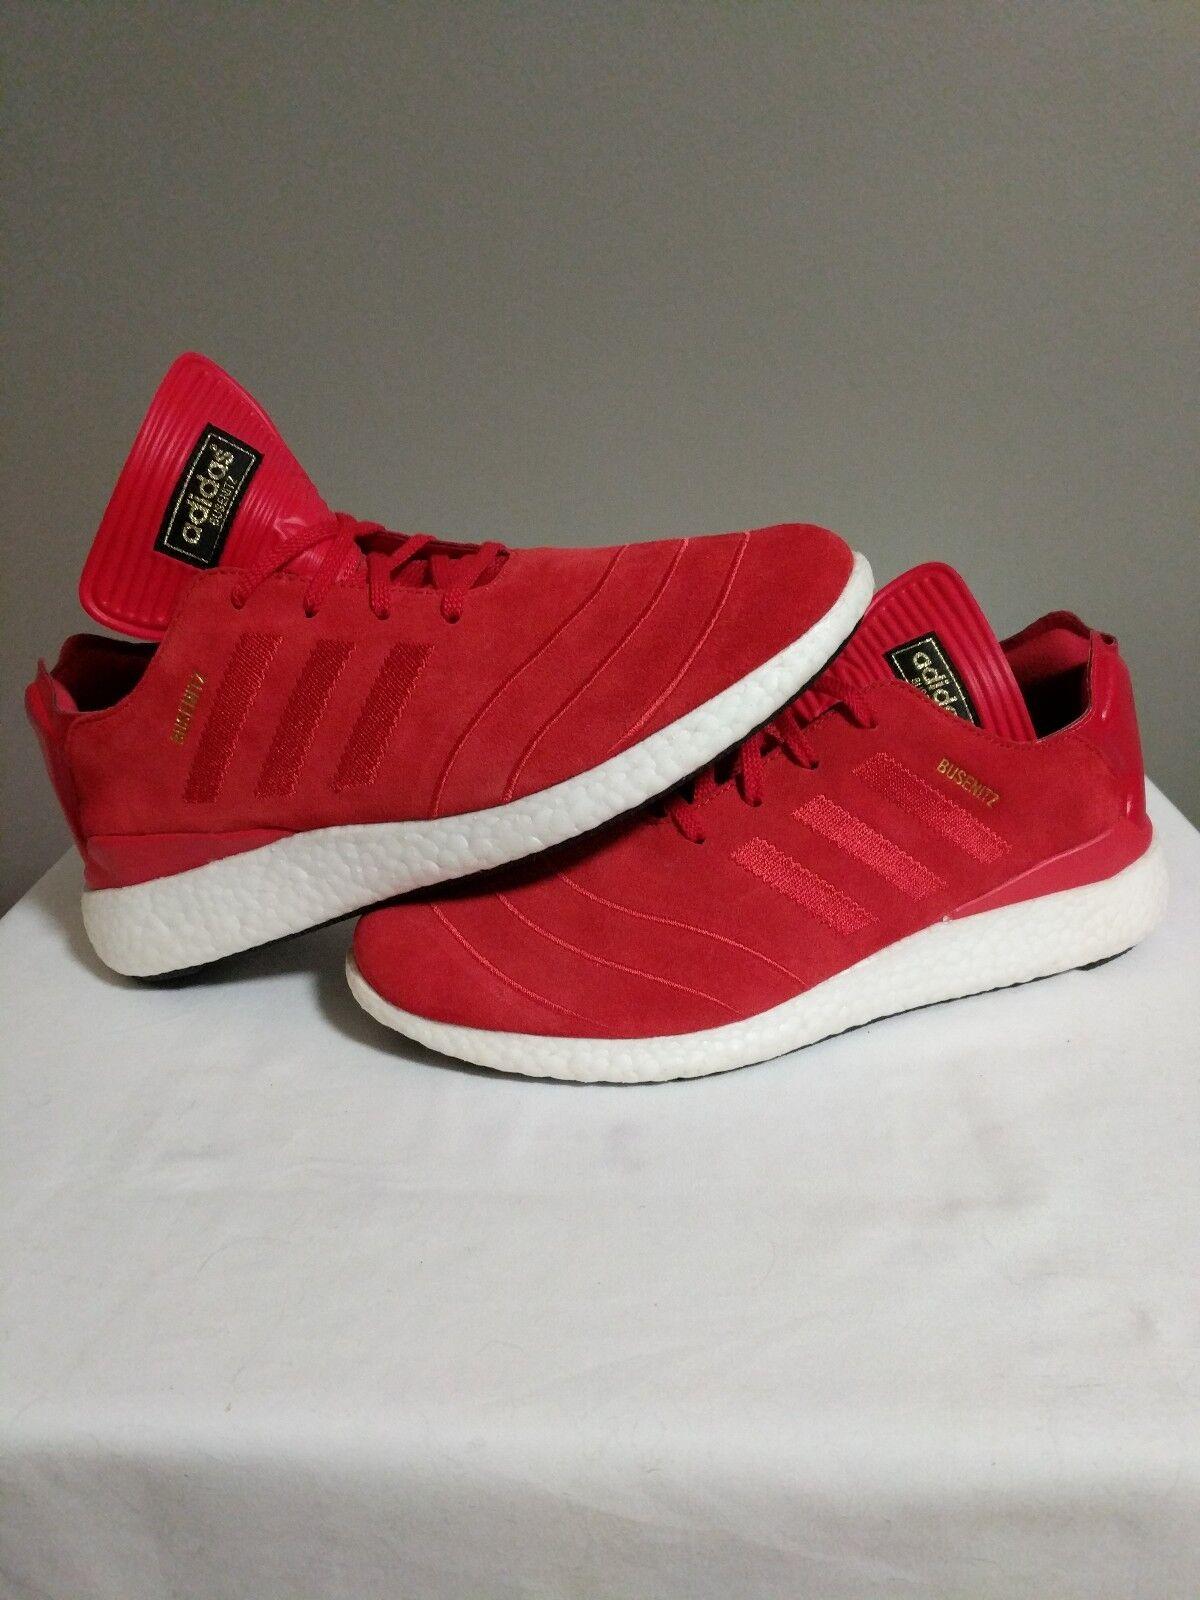 Adidas busenitz Pure Boost Scarlet Red White Sz 10.5